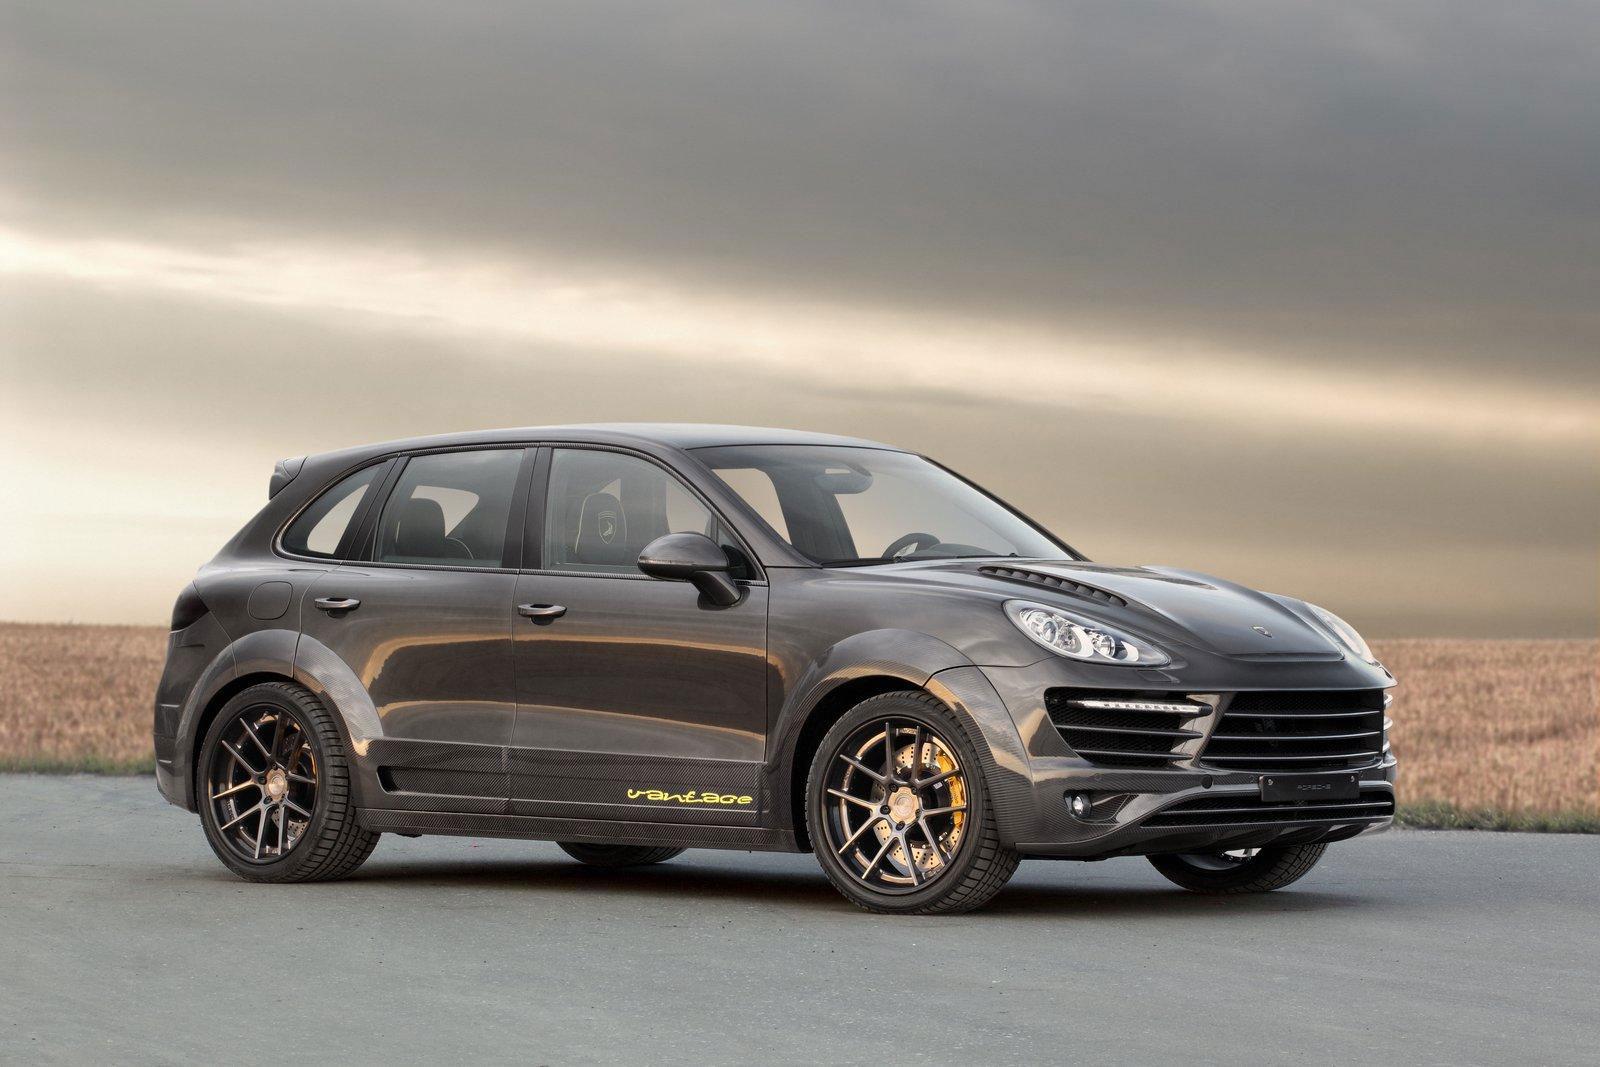 Porsche Cayenne Vantage 2 Carbon Edition 3